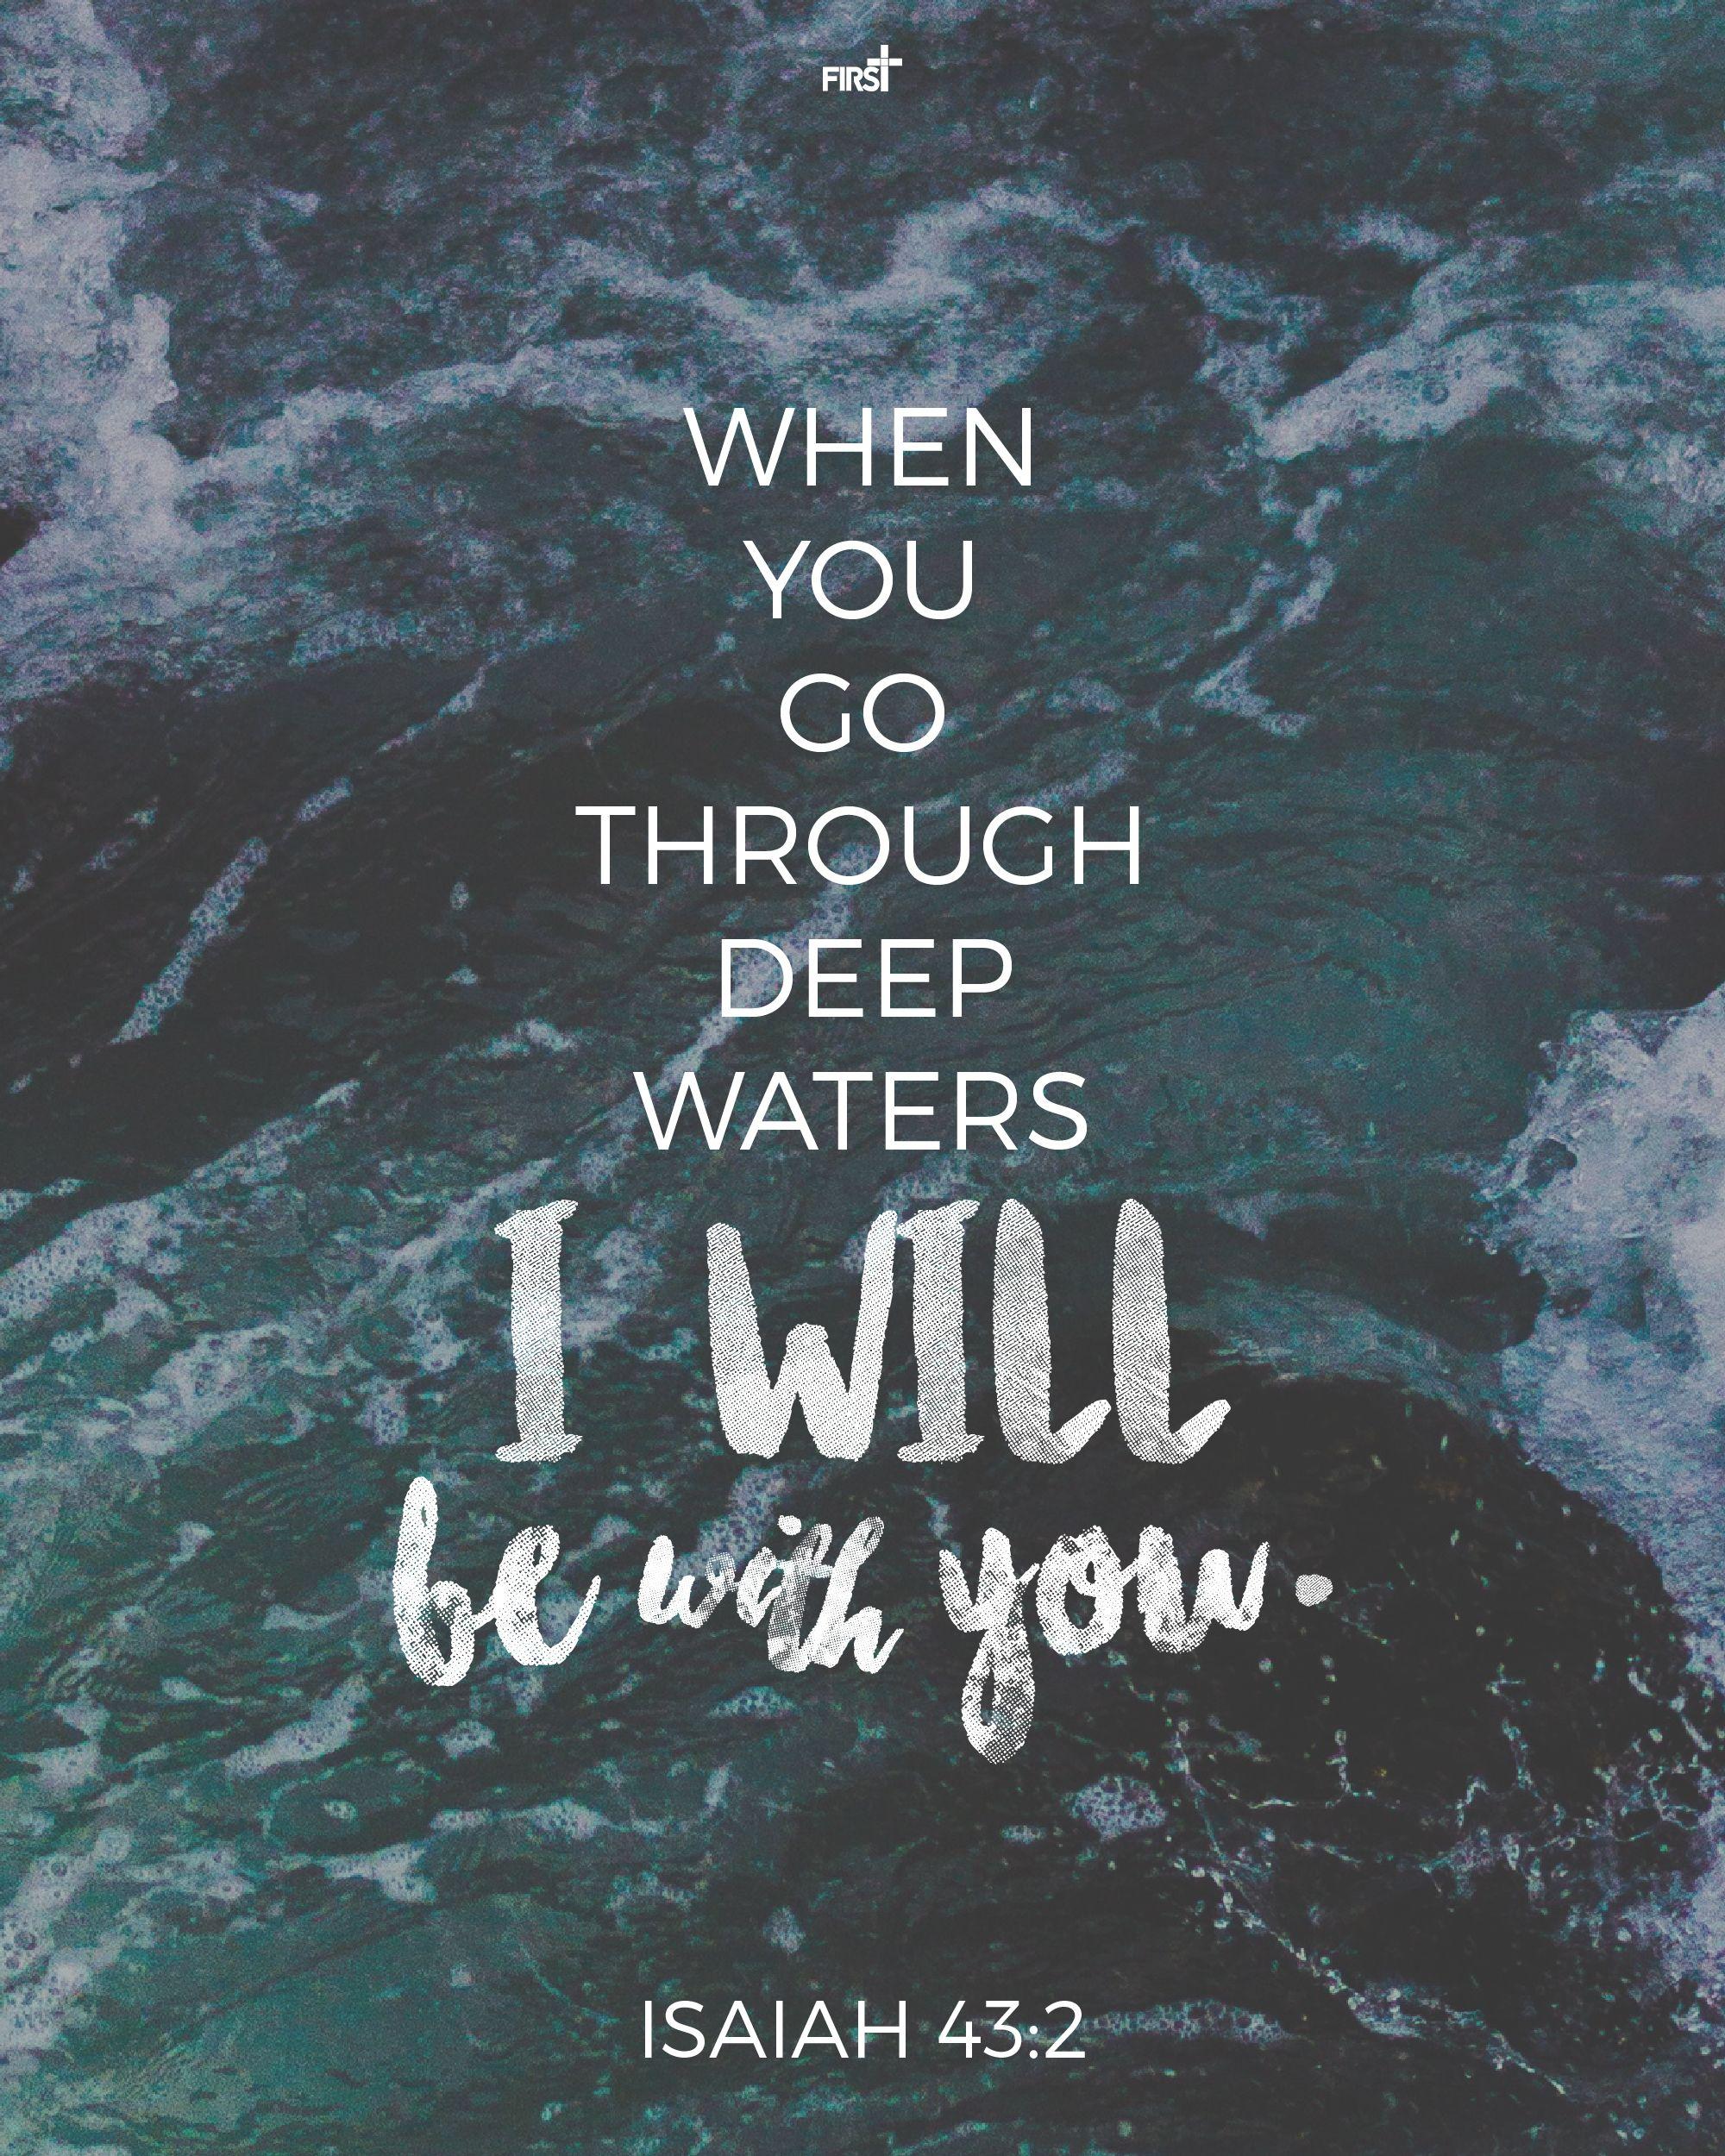 Deep Bible Verses - Vtwctr